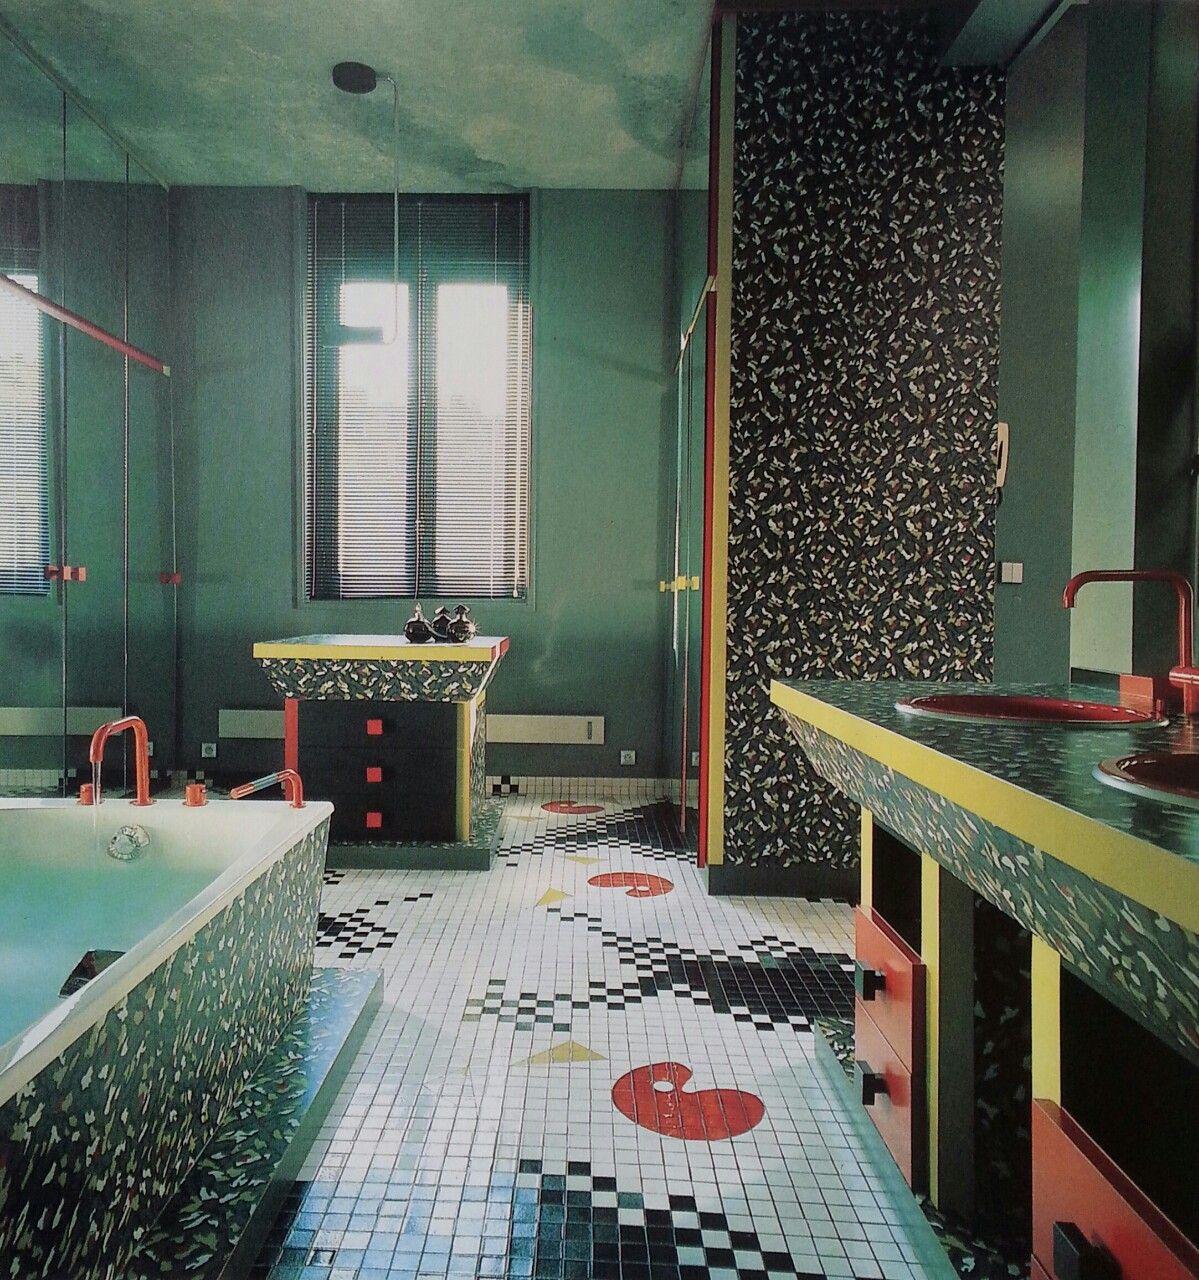 Patterned Laminate PoMo Bathroom, Mirrored Cabinets, Red Fixtures, Pixelated Splatter Tile Floor